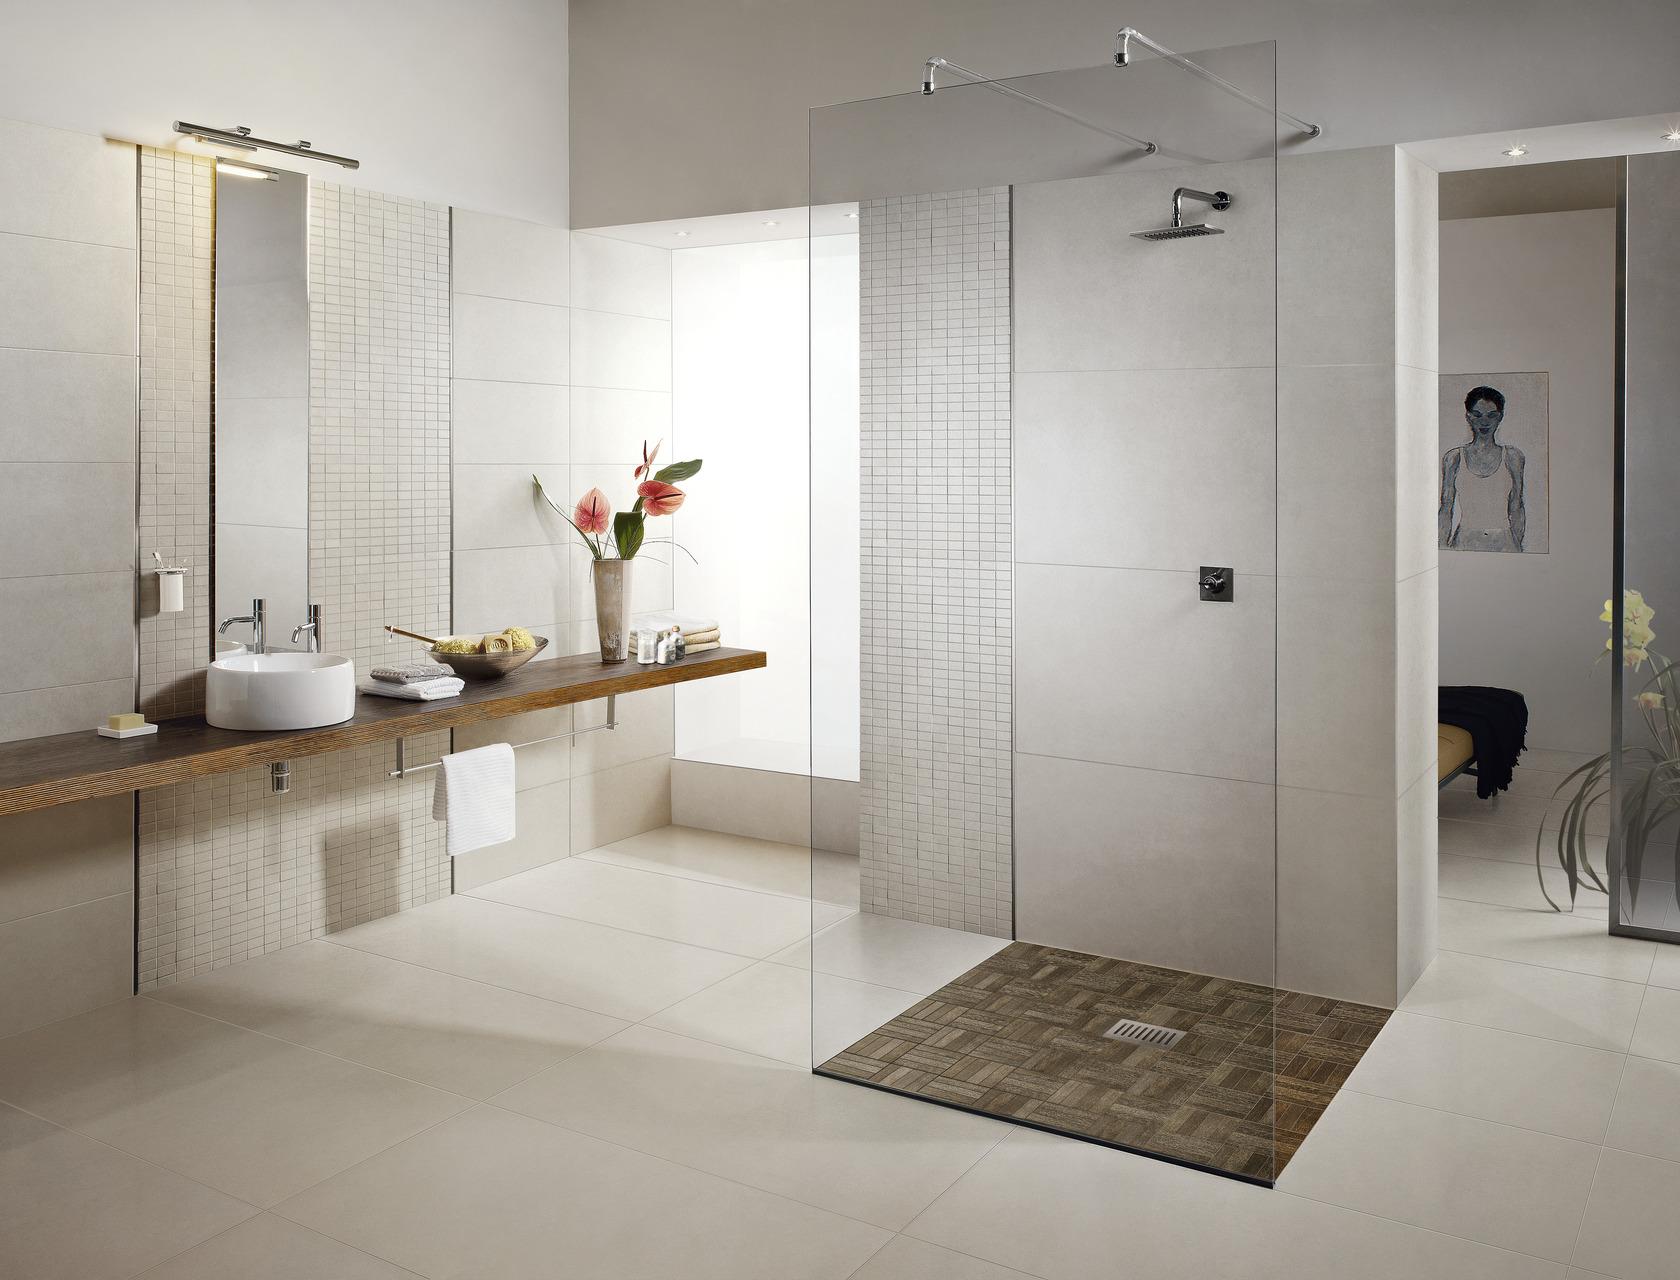 Limra pavimento per esterno interno effetto pietra bianca - Gres effetto pietra ...